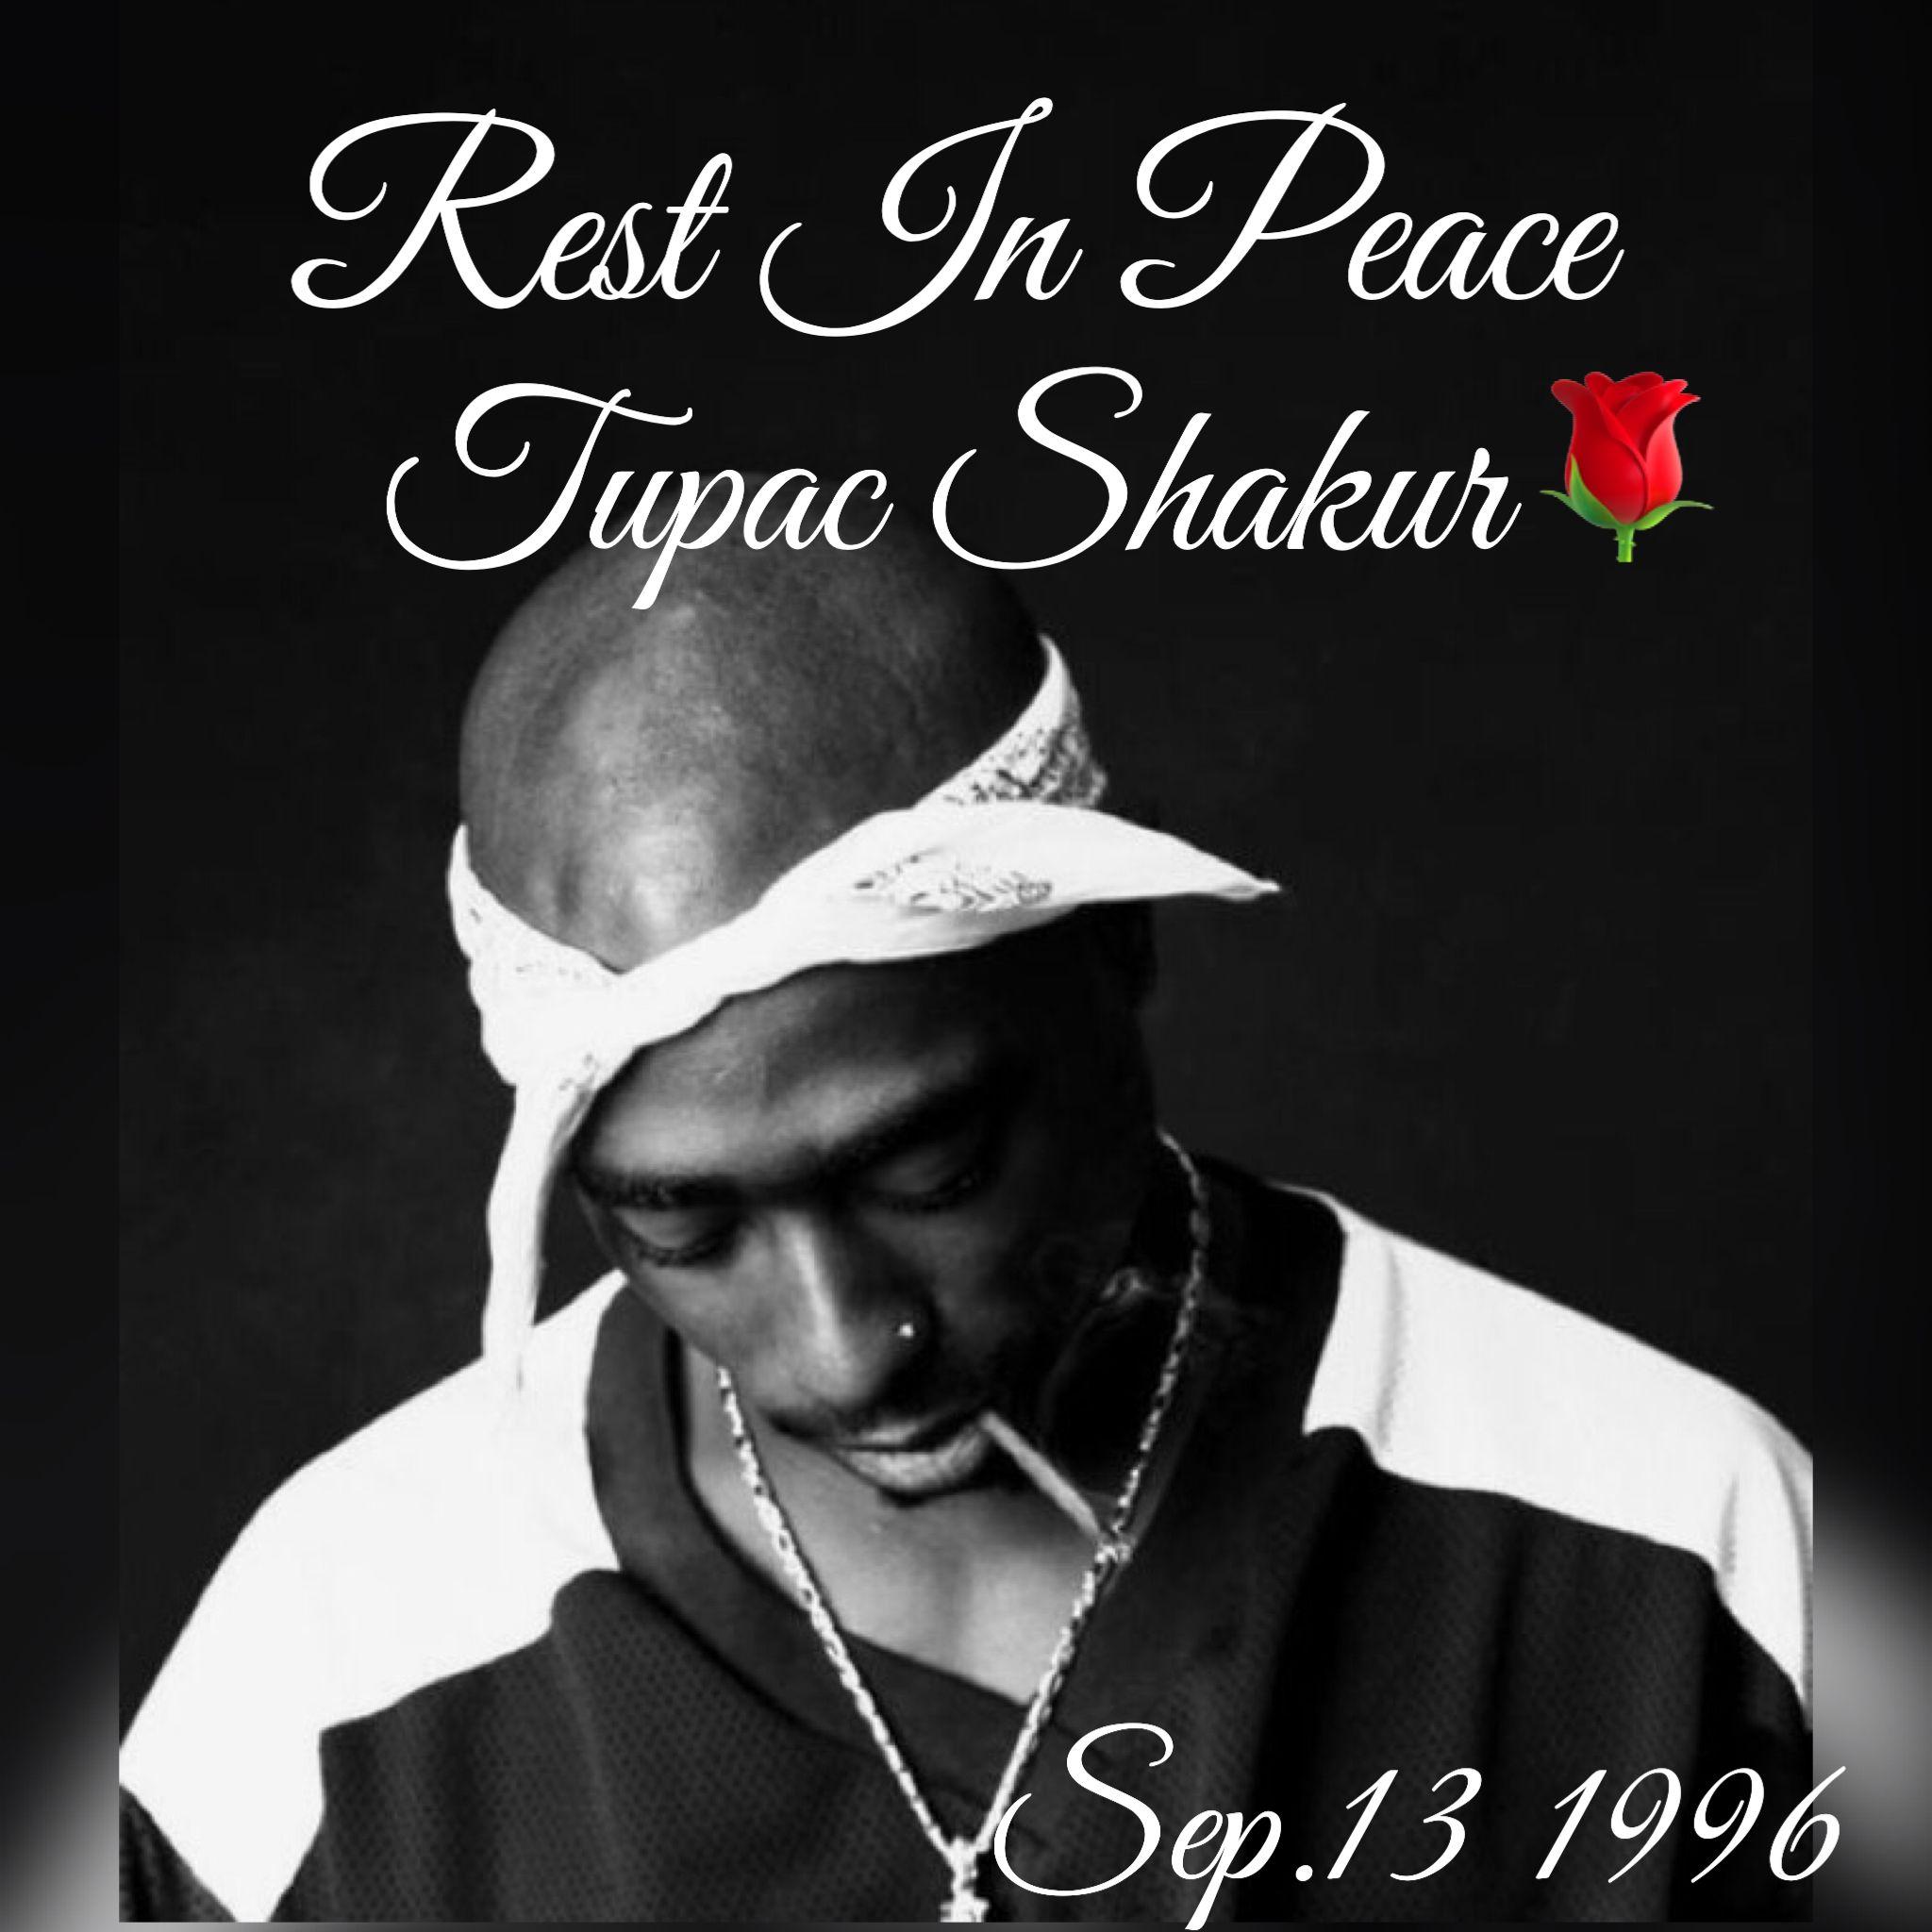 R.I.P. 2pac | Tupac, Tupac shakur, Tupac makaveli